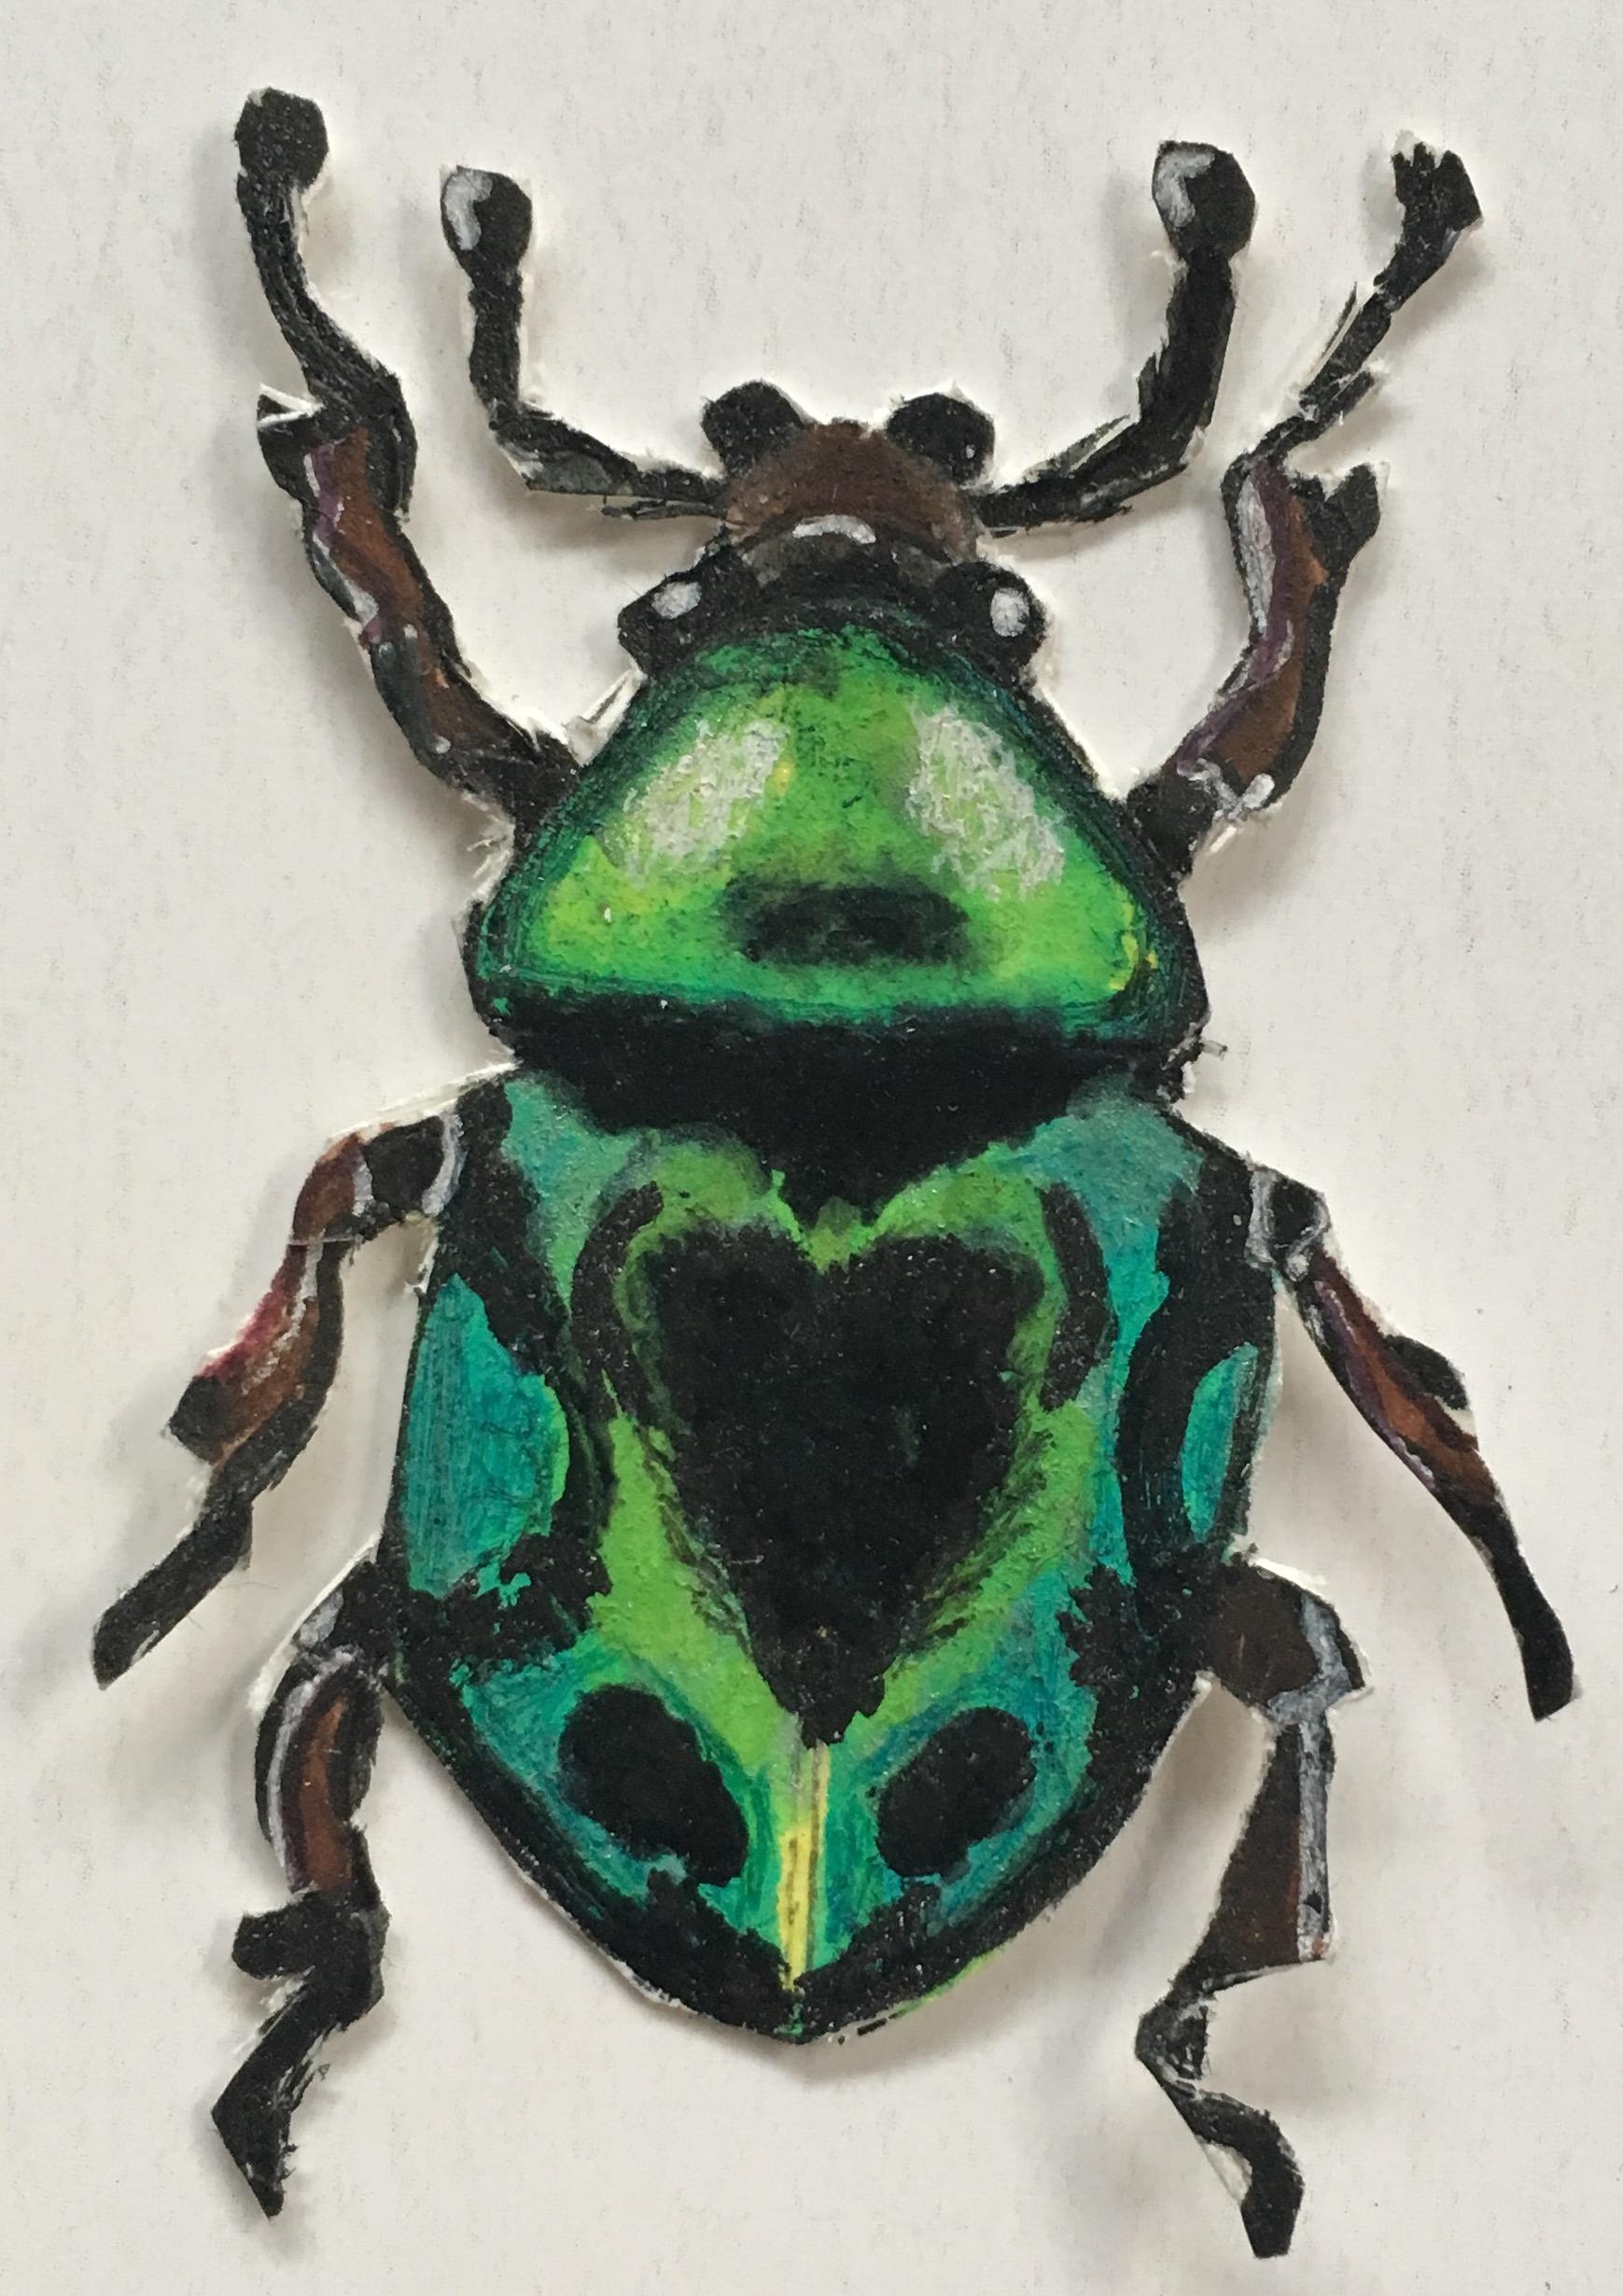 green bug cutout with teal.jpg